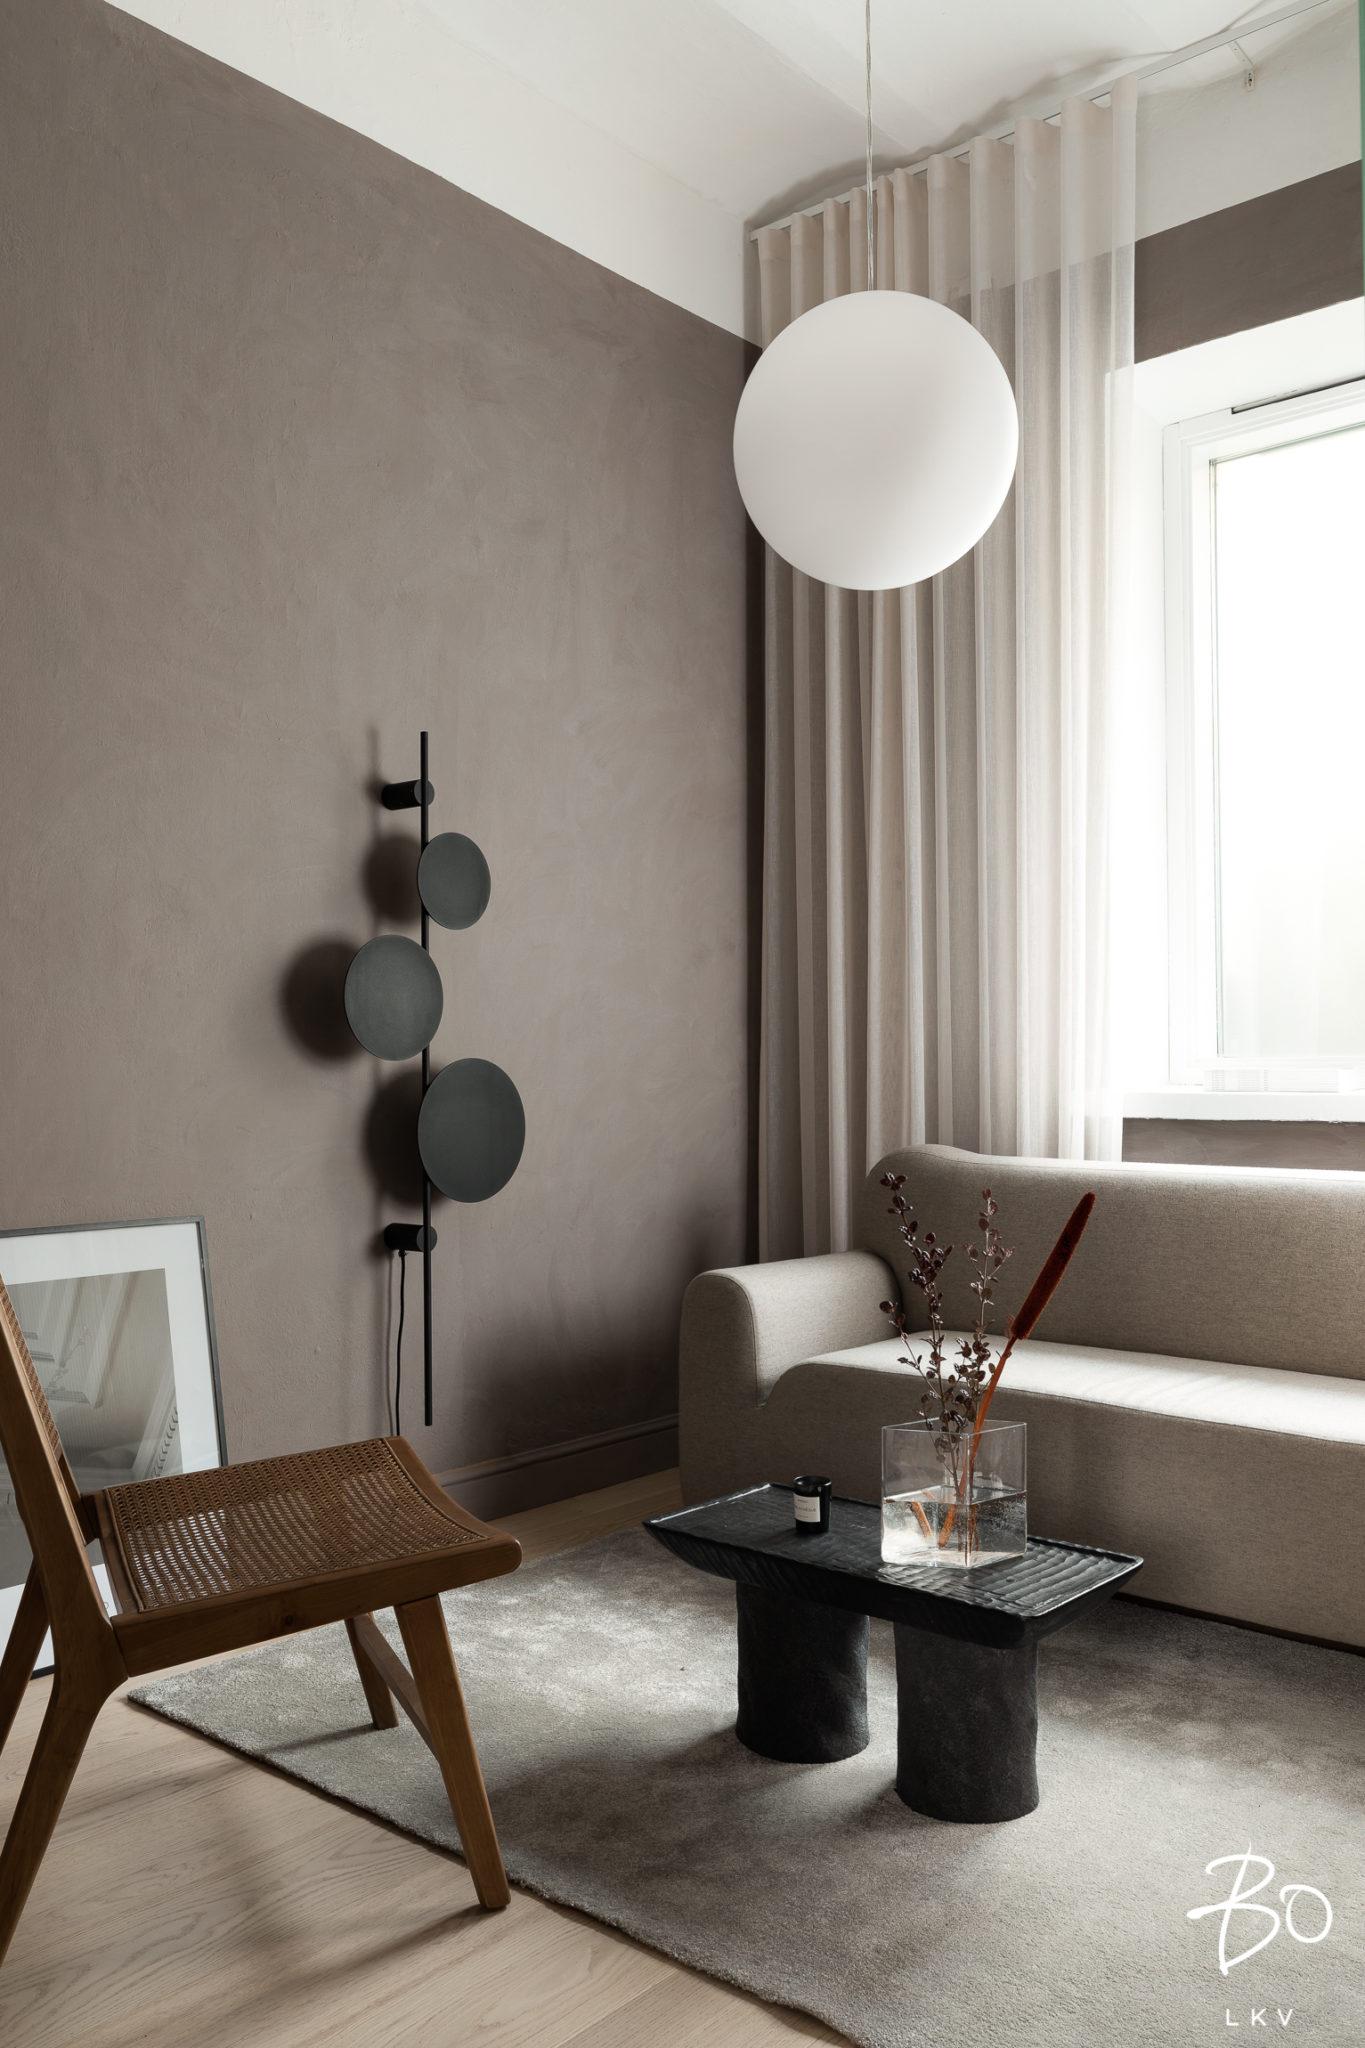 toimisto-sisustus-lounge-bolkv